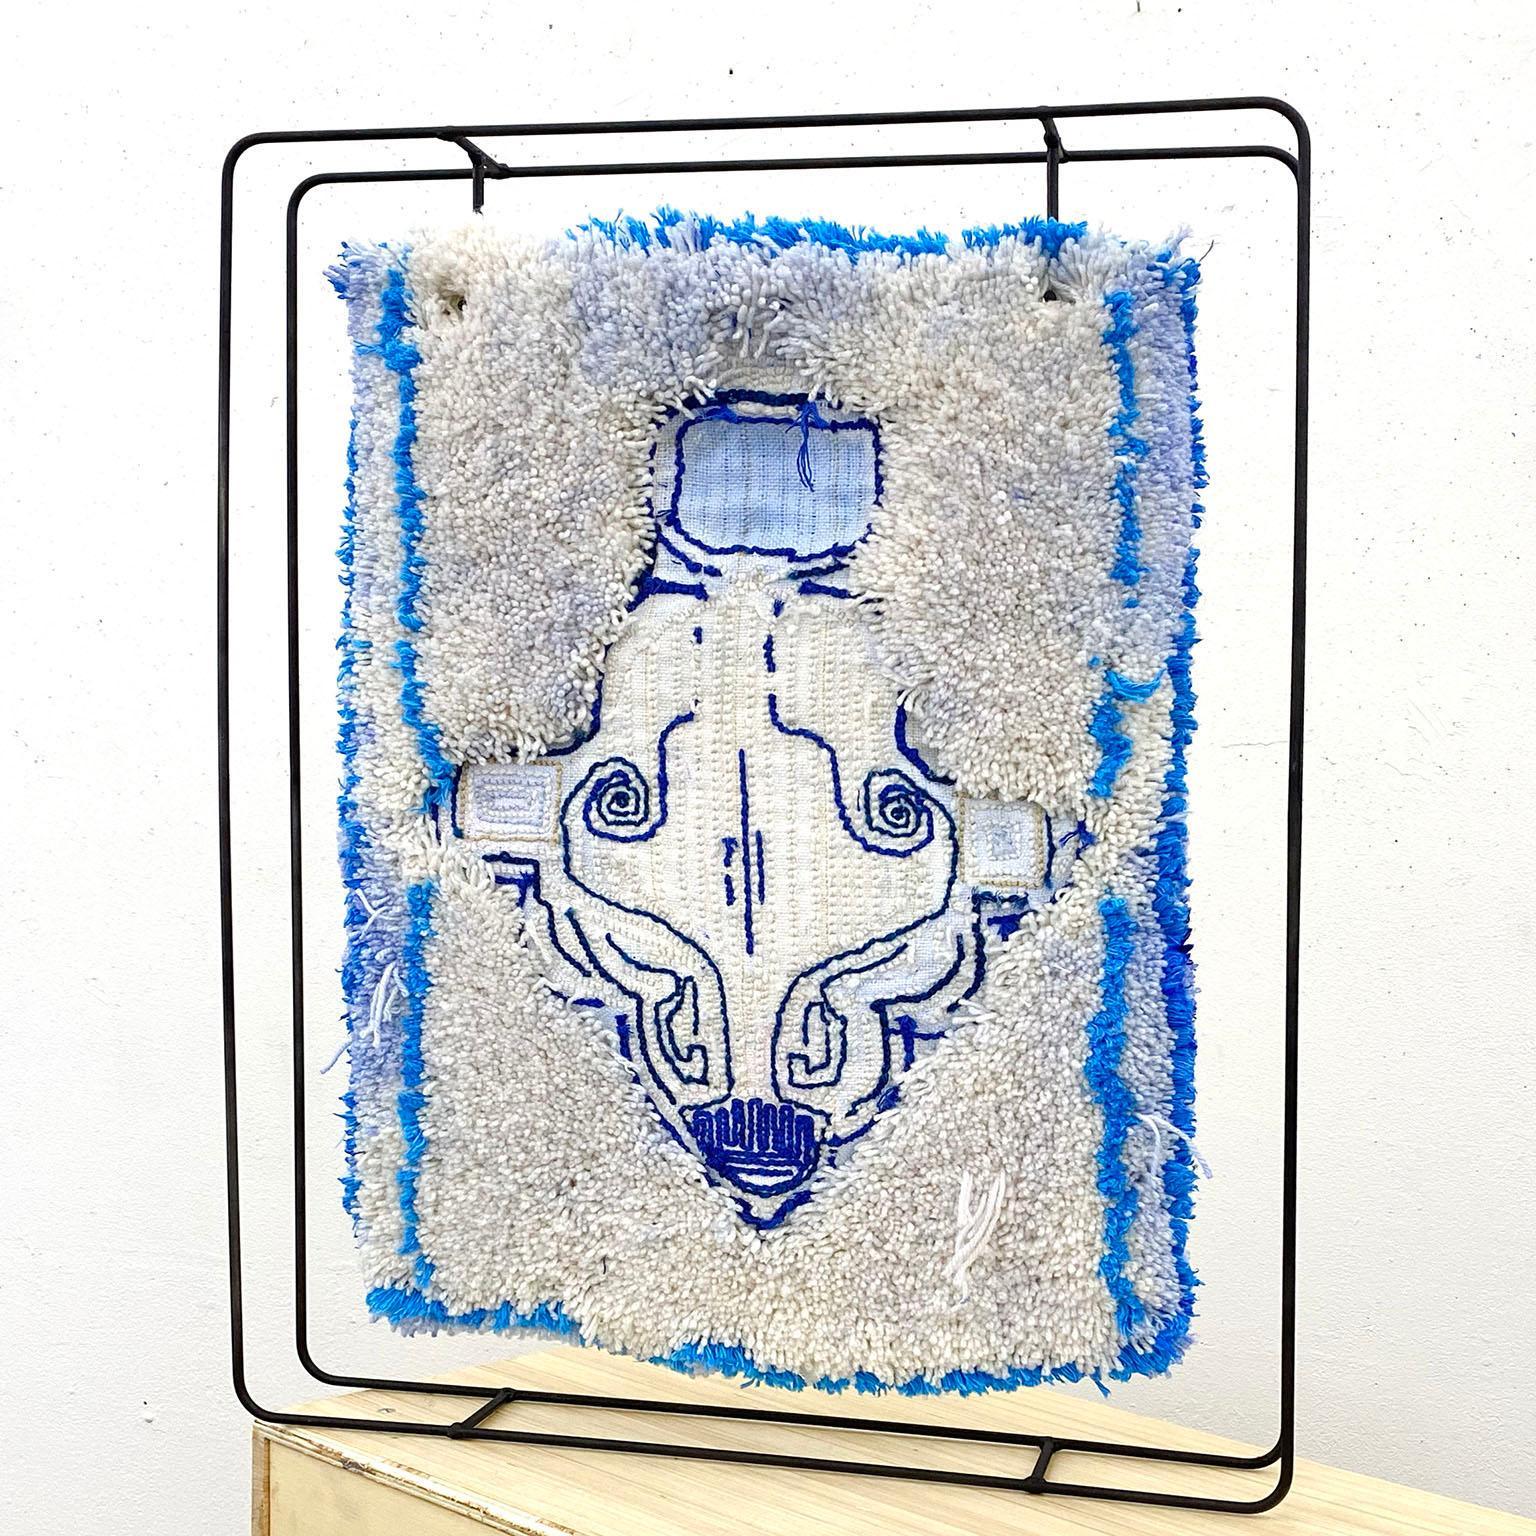 Textile Sculpture on Steel frame: 'Dressy Dickie'